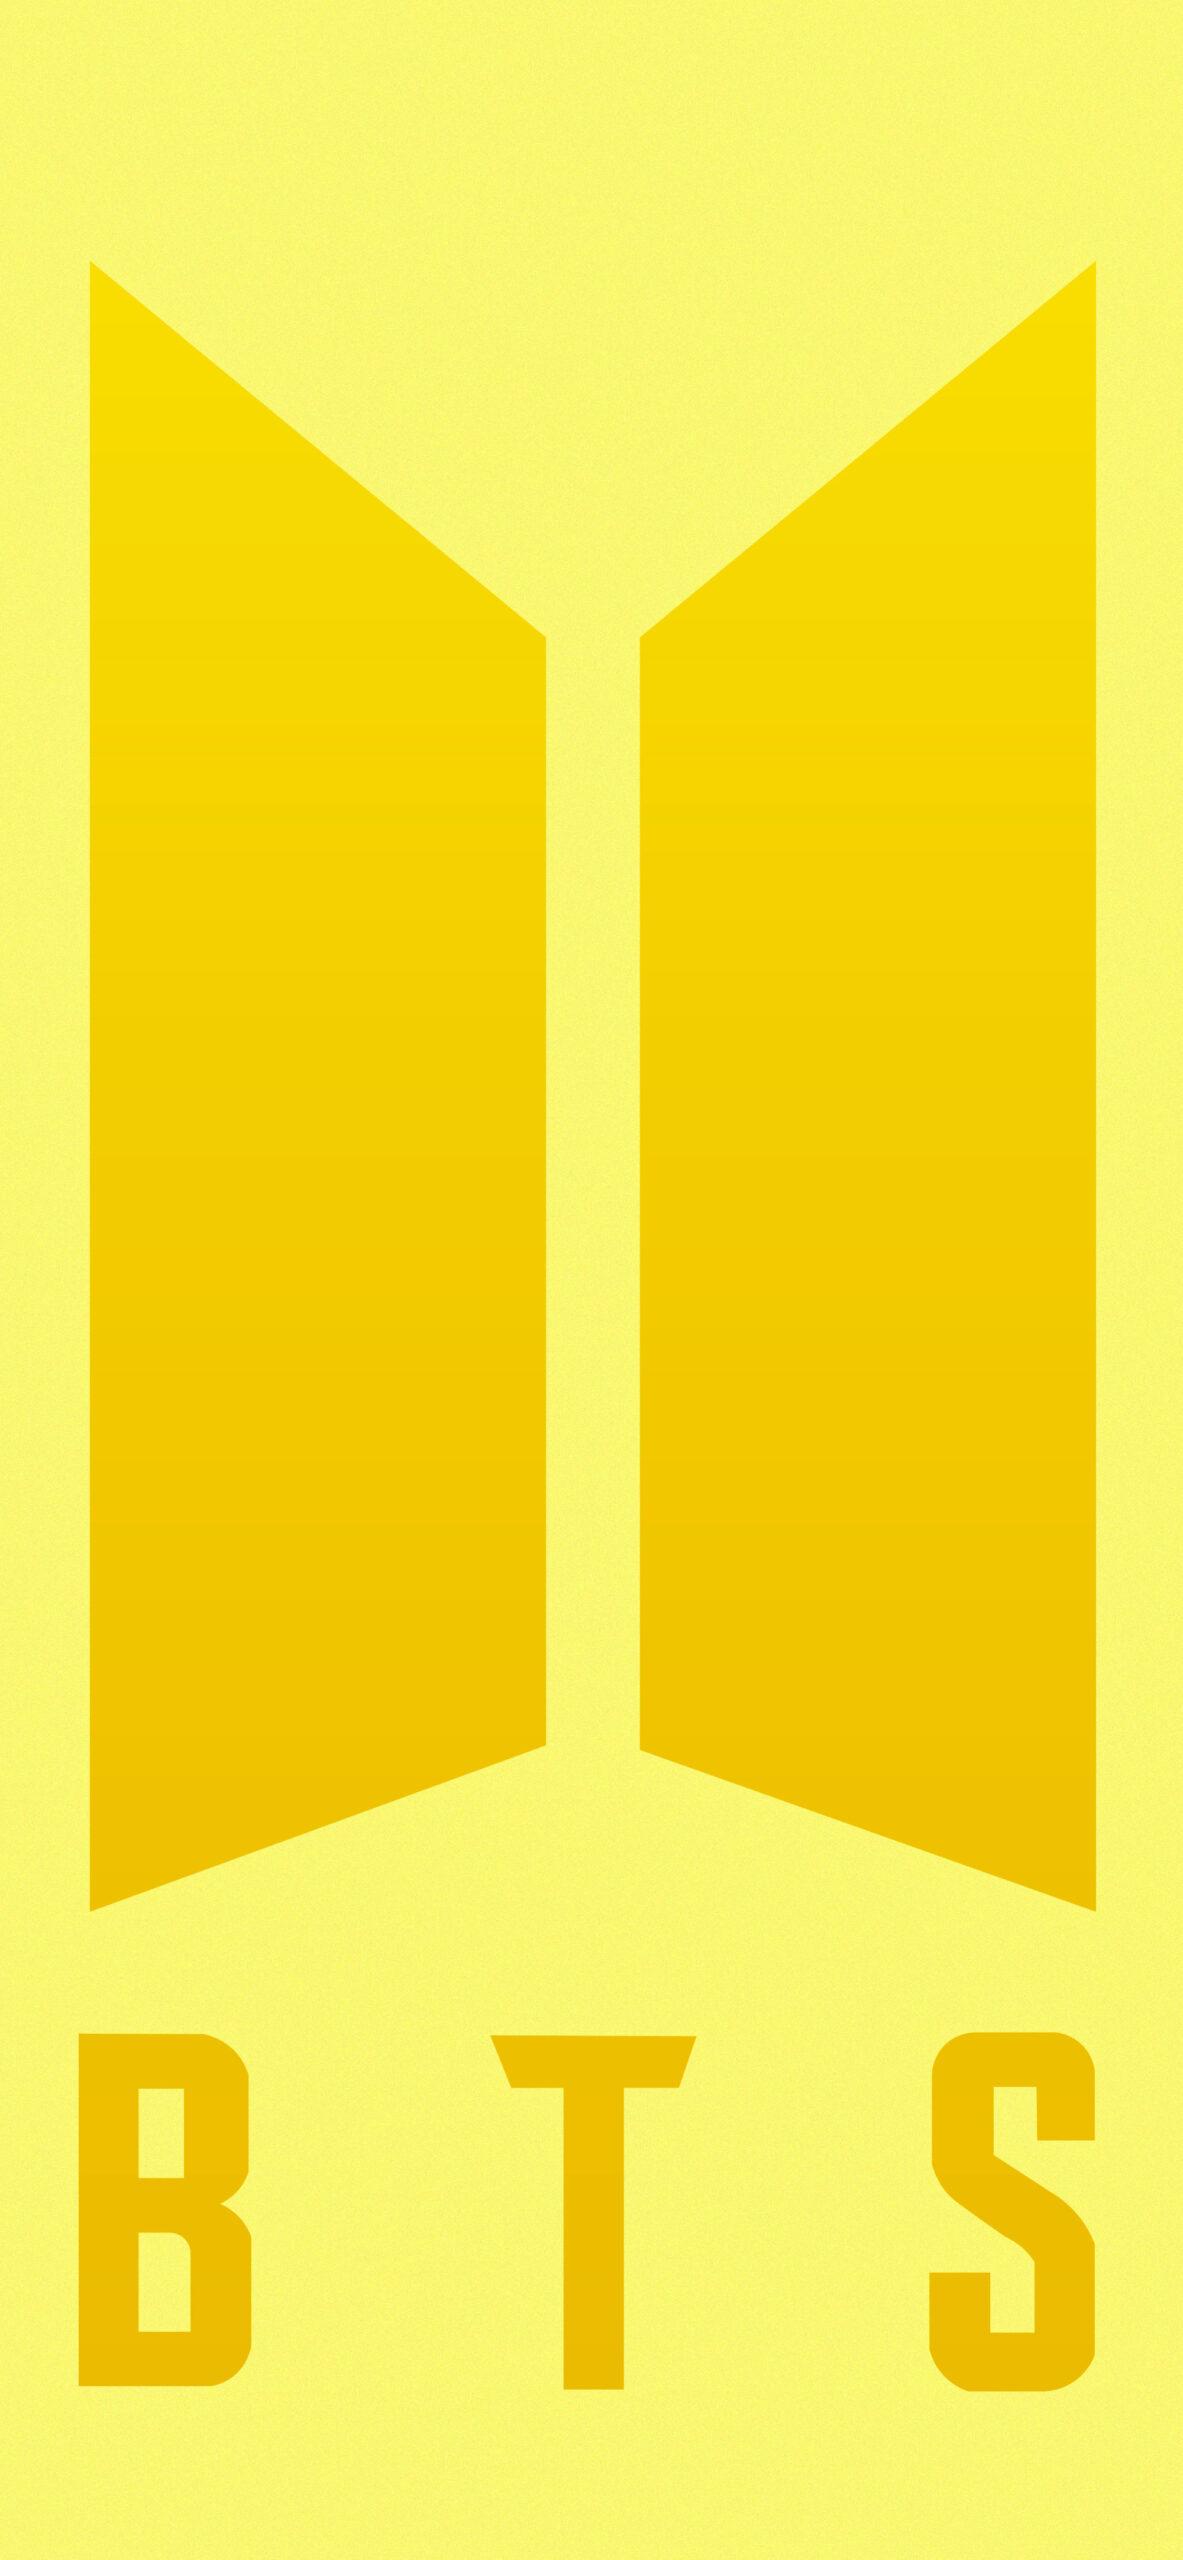 bts bt21 chimmy yellow background